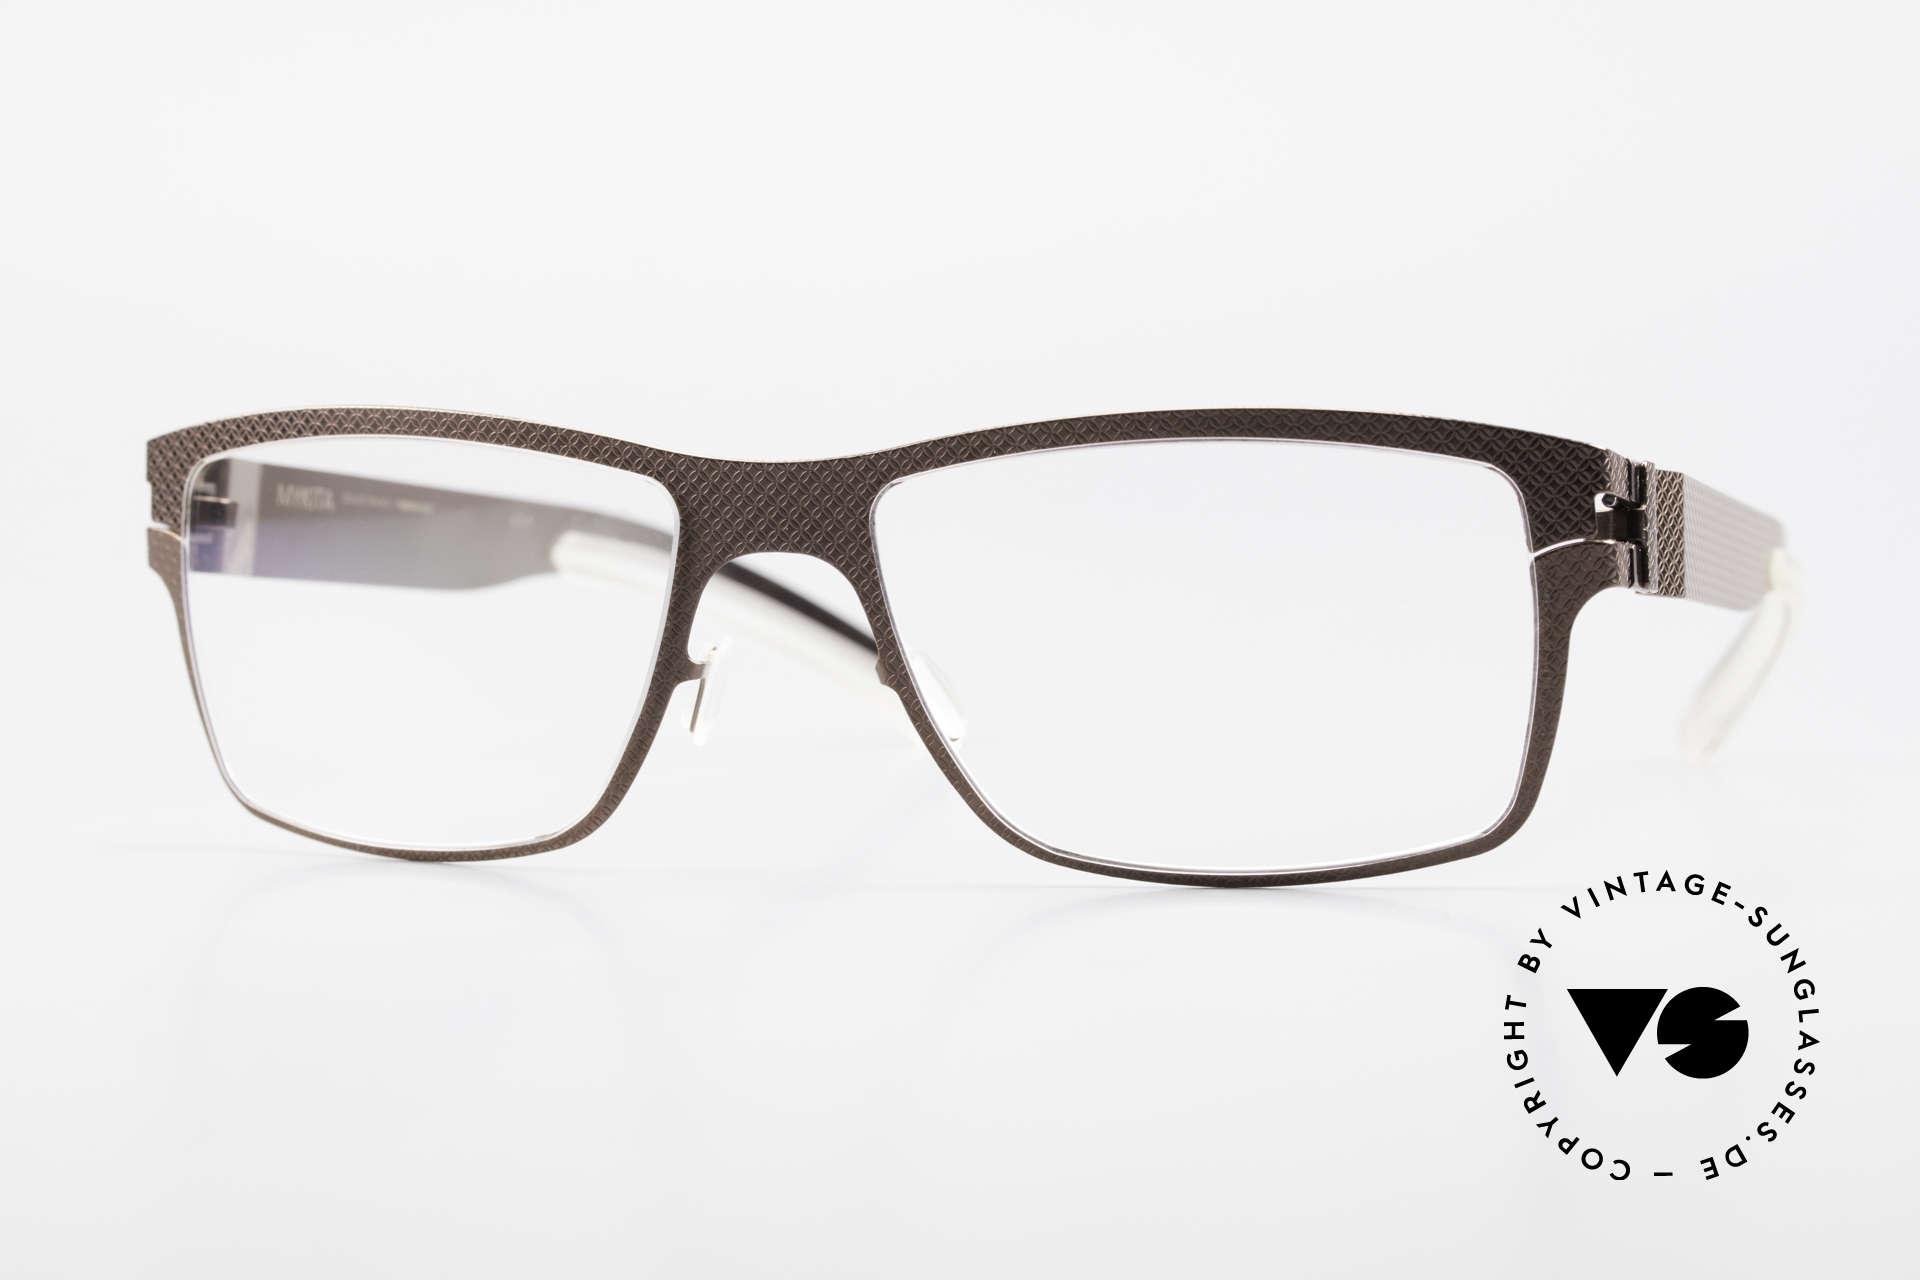 Mykita Bernhard Mykita Vintage Eyeglasses 2009, original VINTAGE MYKITA men's sunglasses from 2009, Made for Men